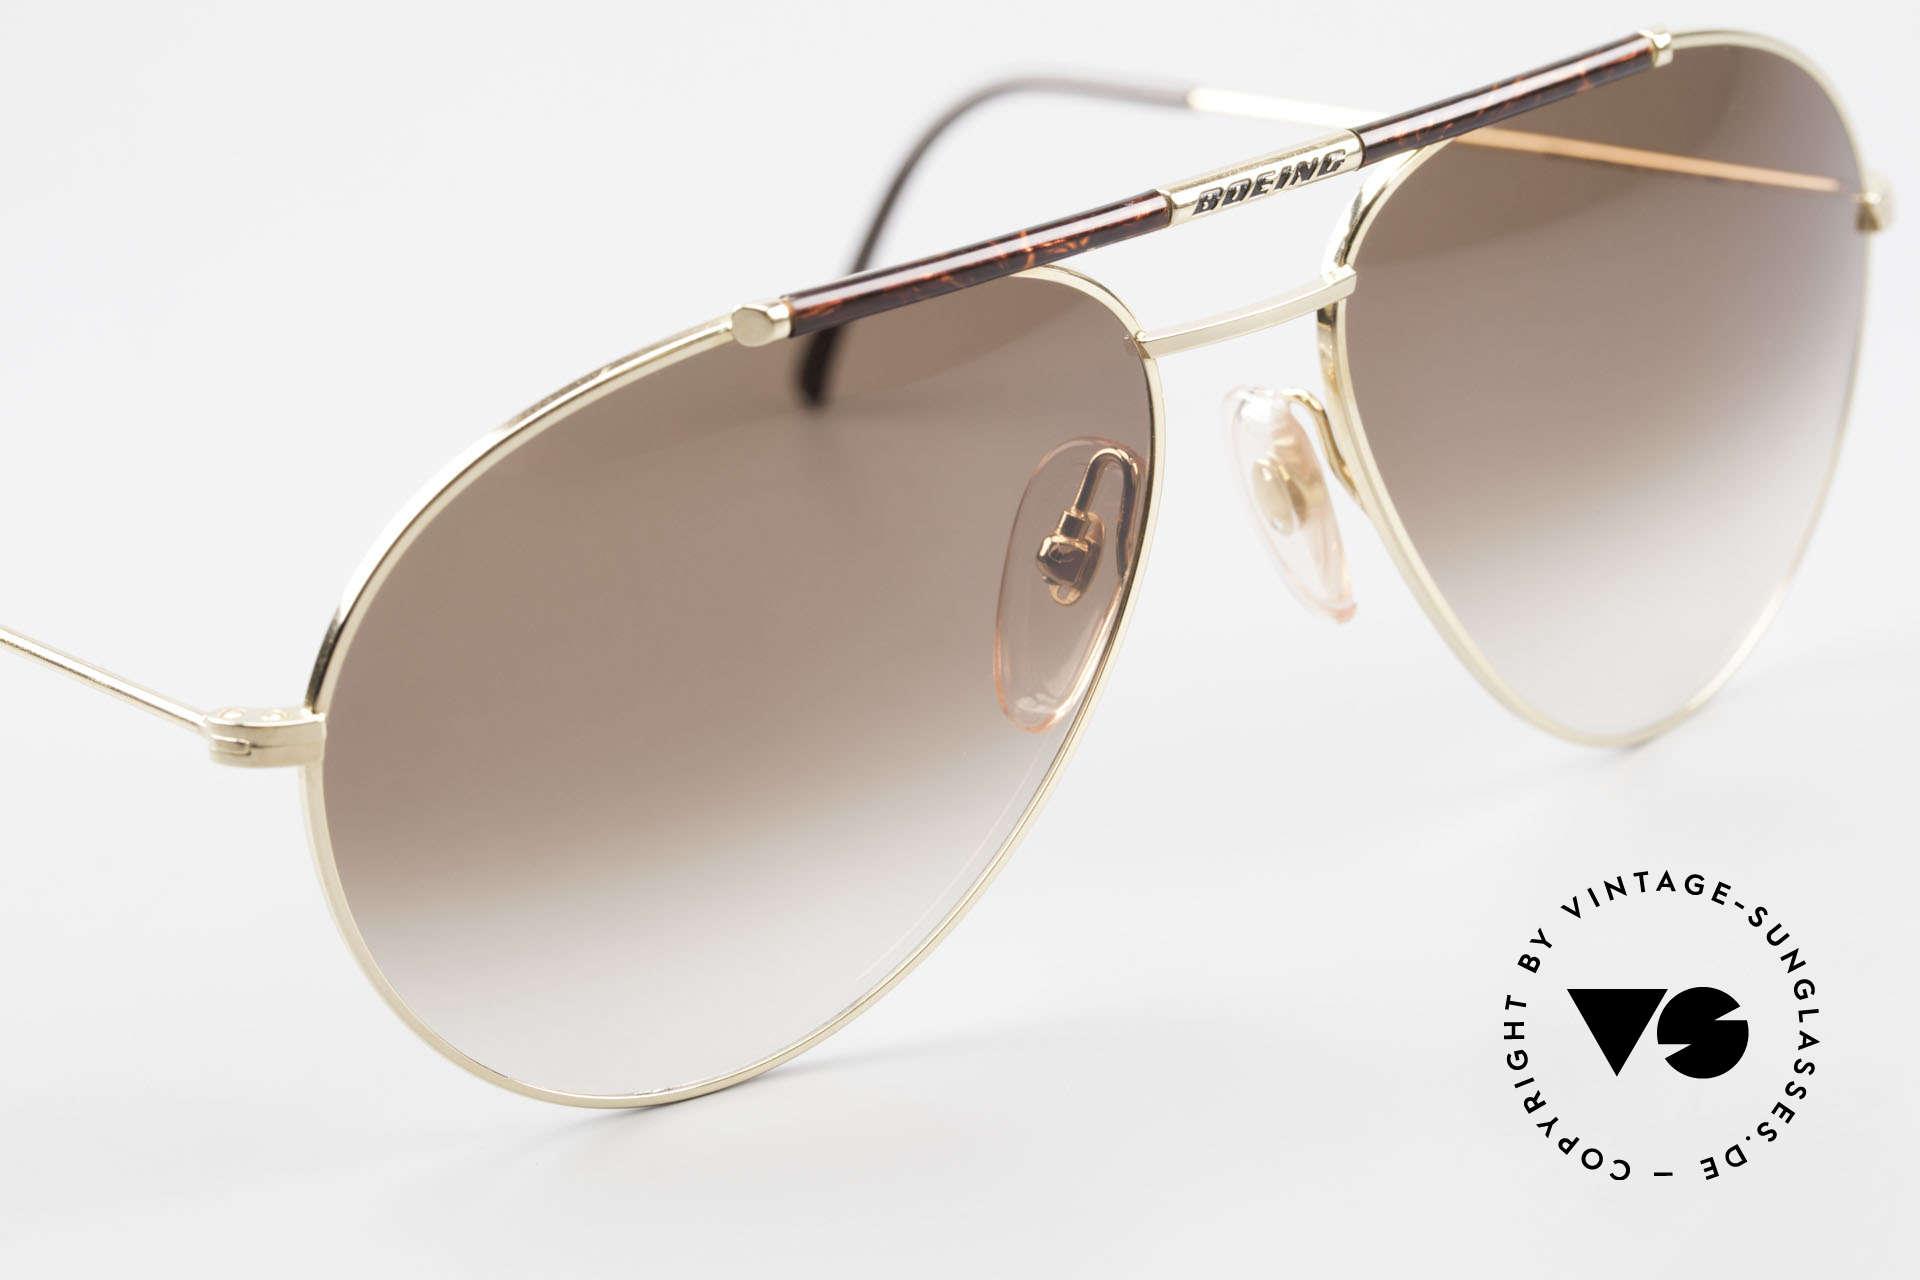 Boeing 5706 No Retro Glasses True Vintage, designer- and collector's item (true vintage rarity), Made for Men